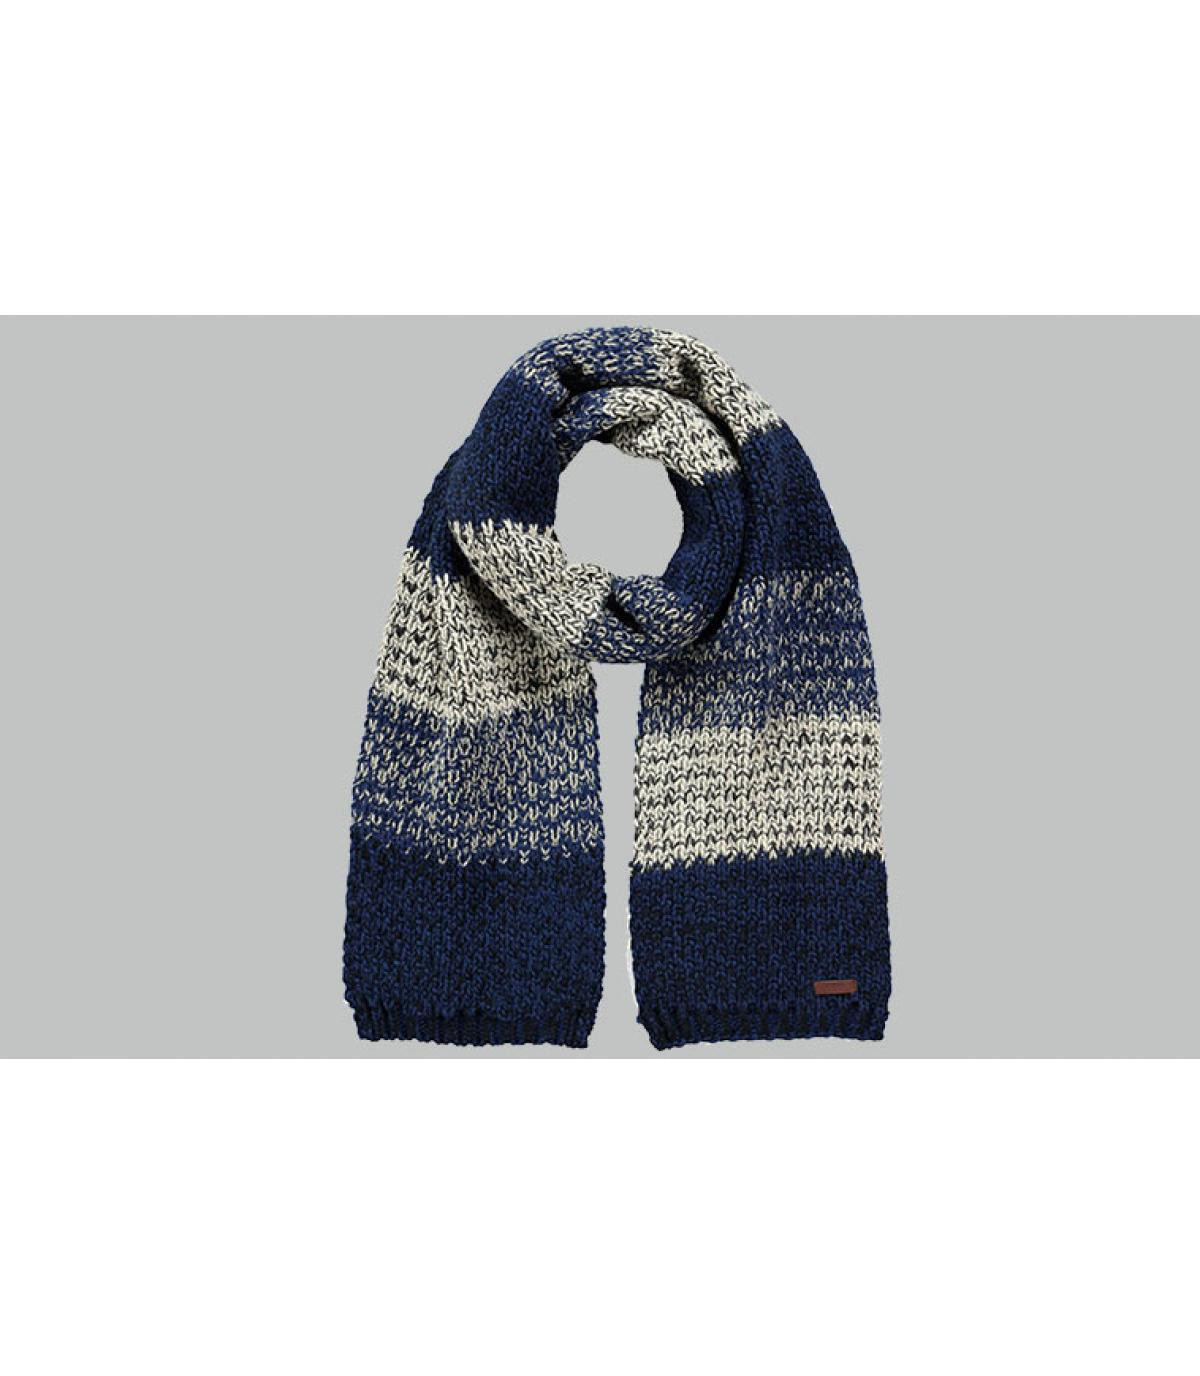 Schal gestreift blau grau